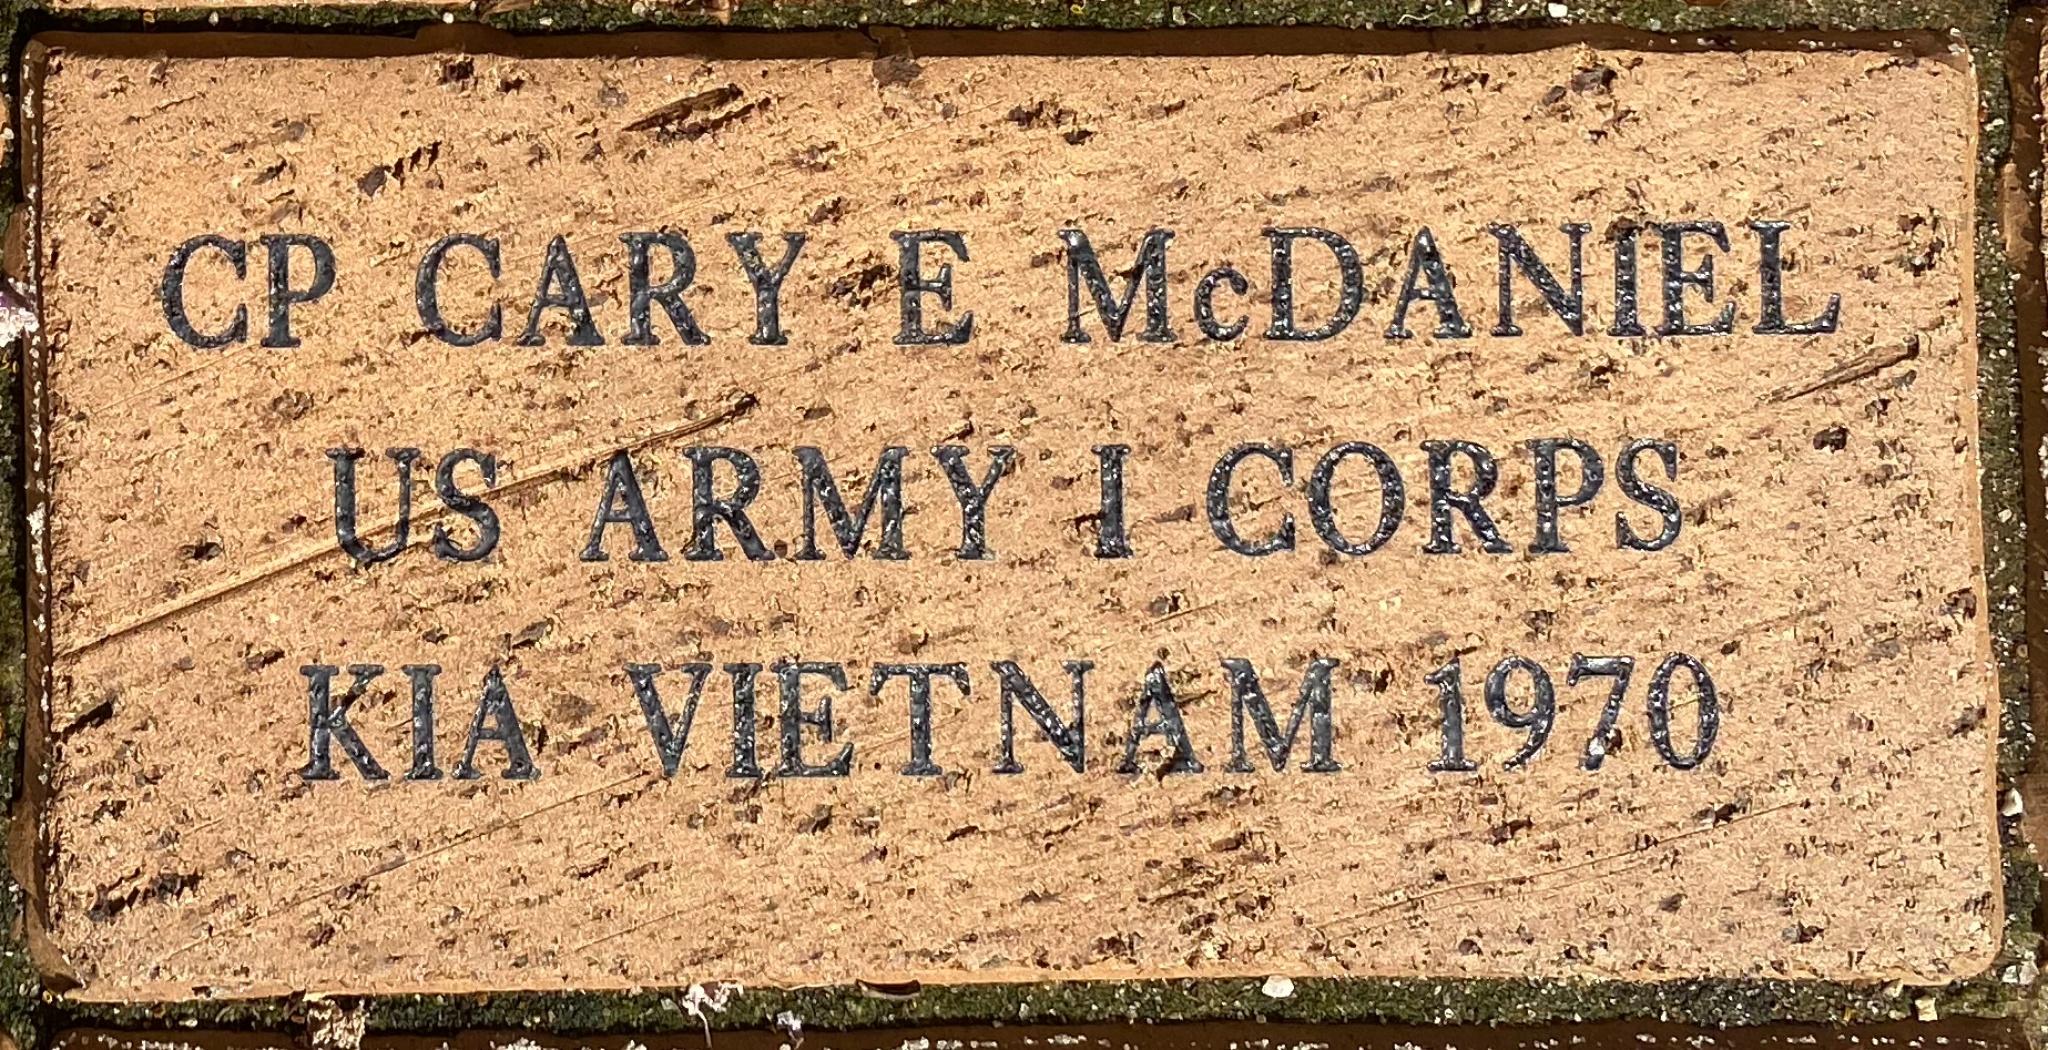 CP CARY E McDANIEL US ARMY I CORPS KIA VIETNAM 1970